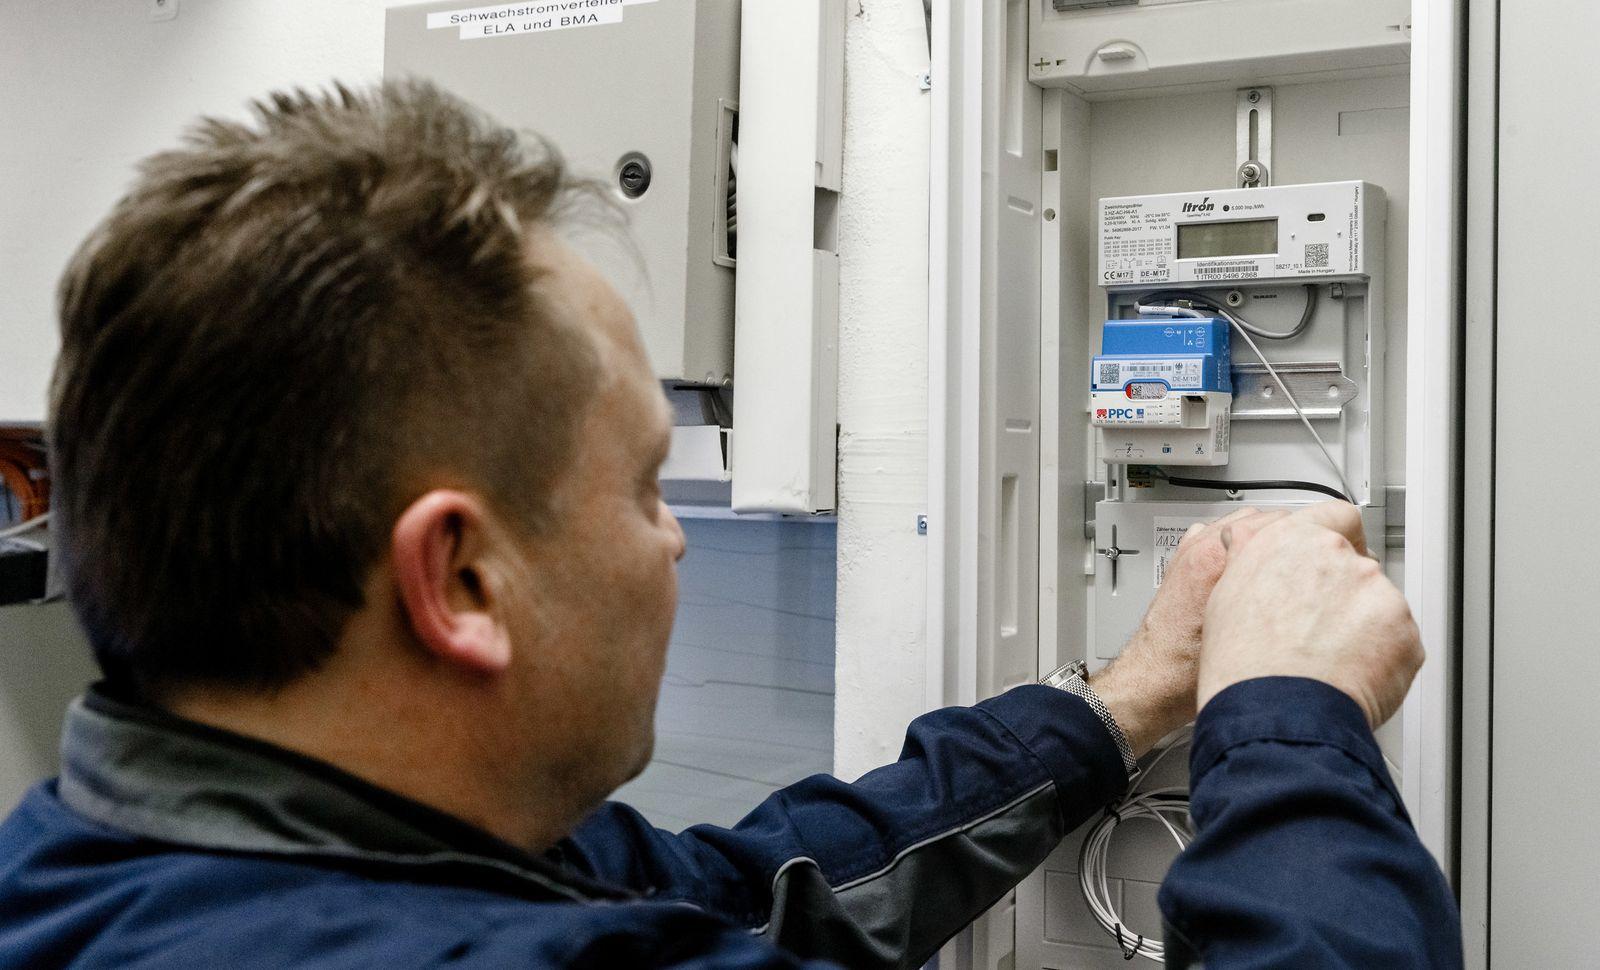 Strombranche fordert eigenes Funknetz